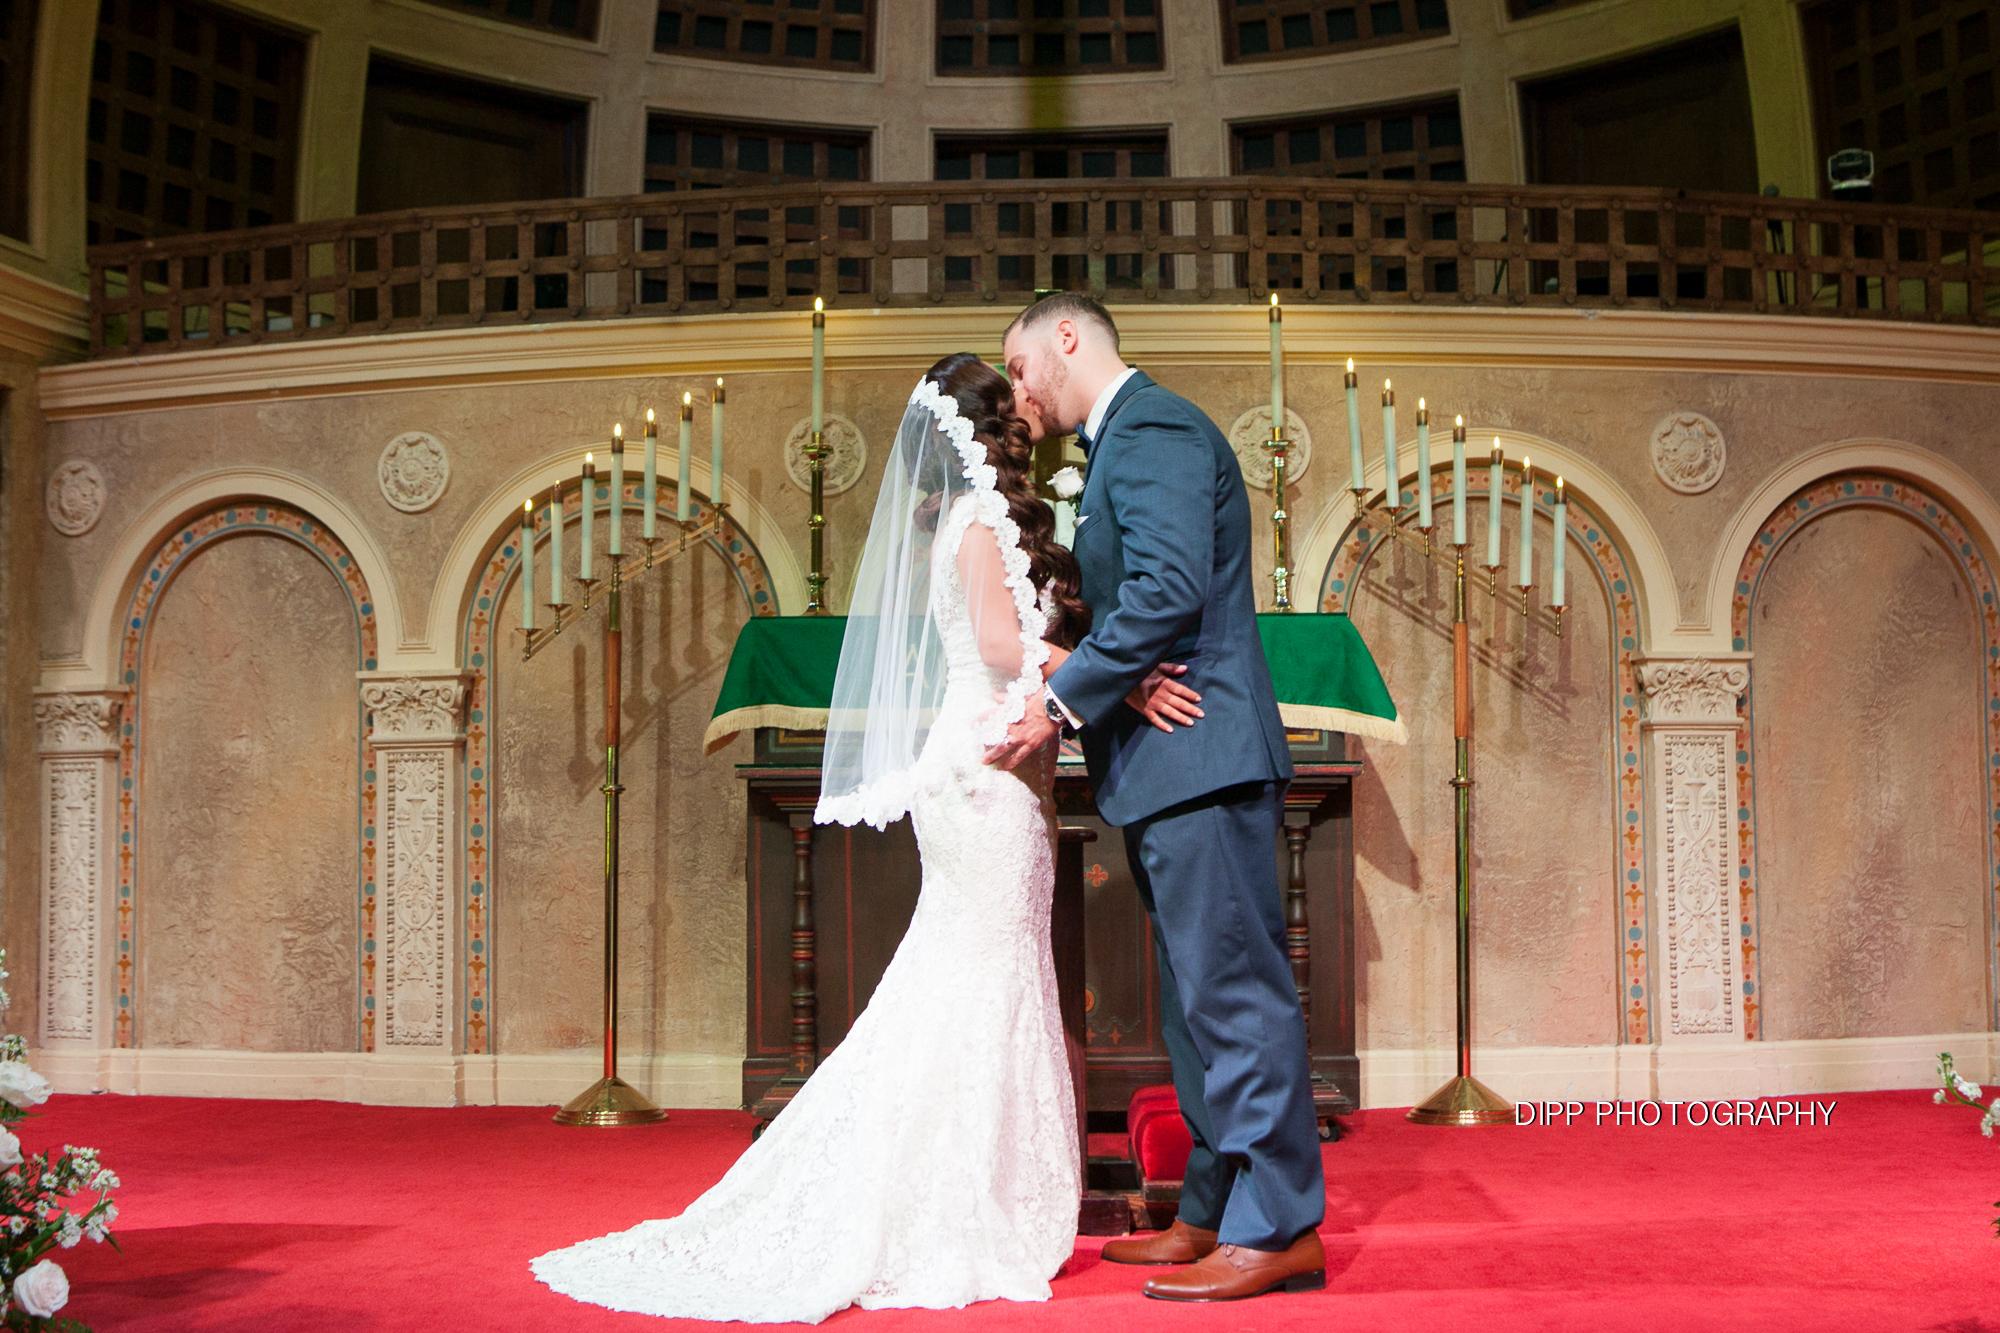 Dipp_2016 EDITED Melissa & Avilio Wedding-226